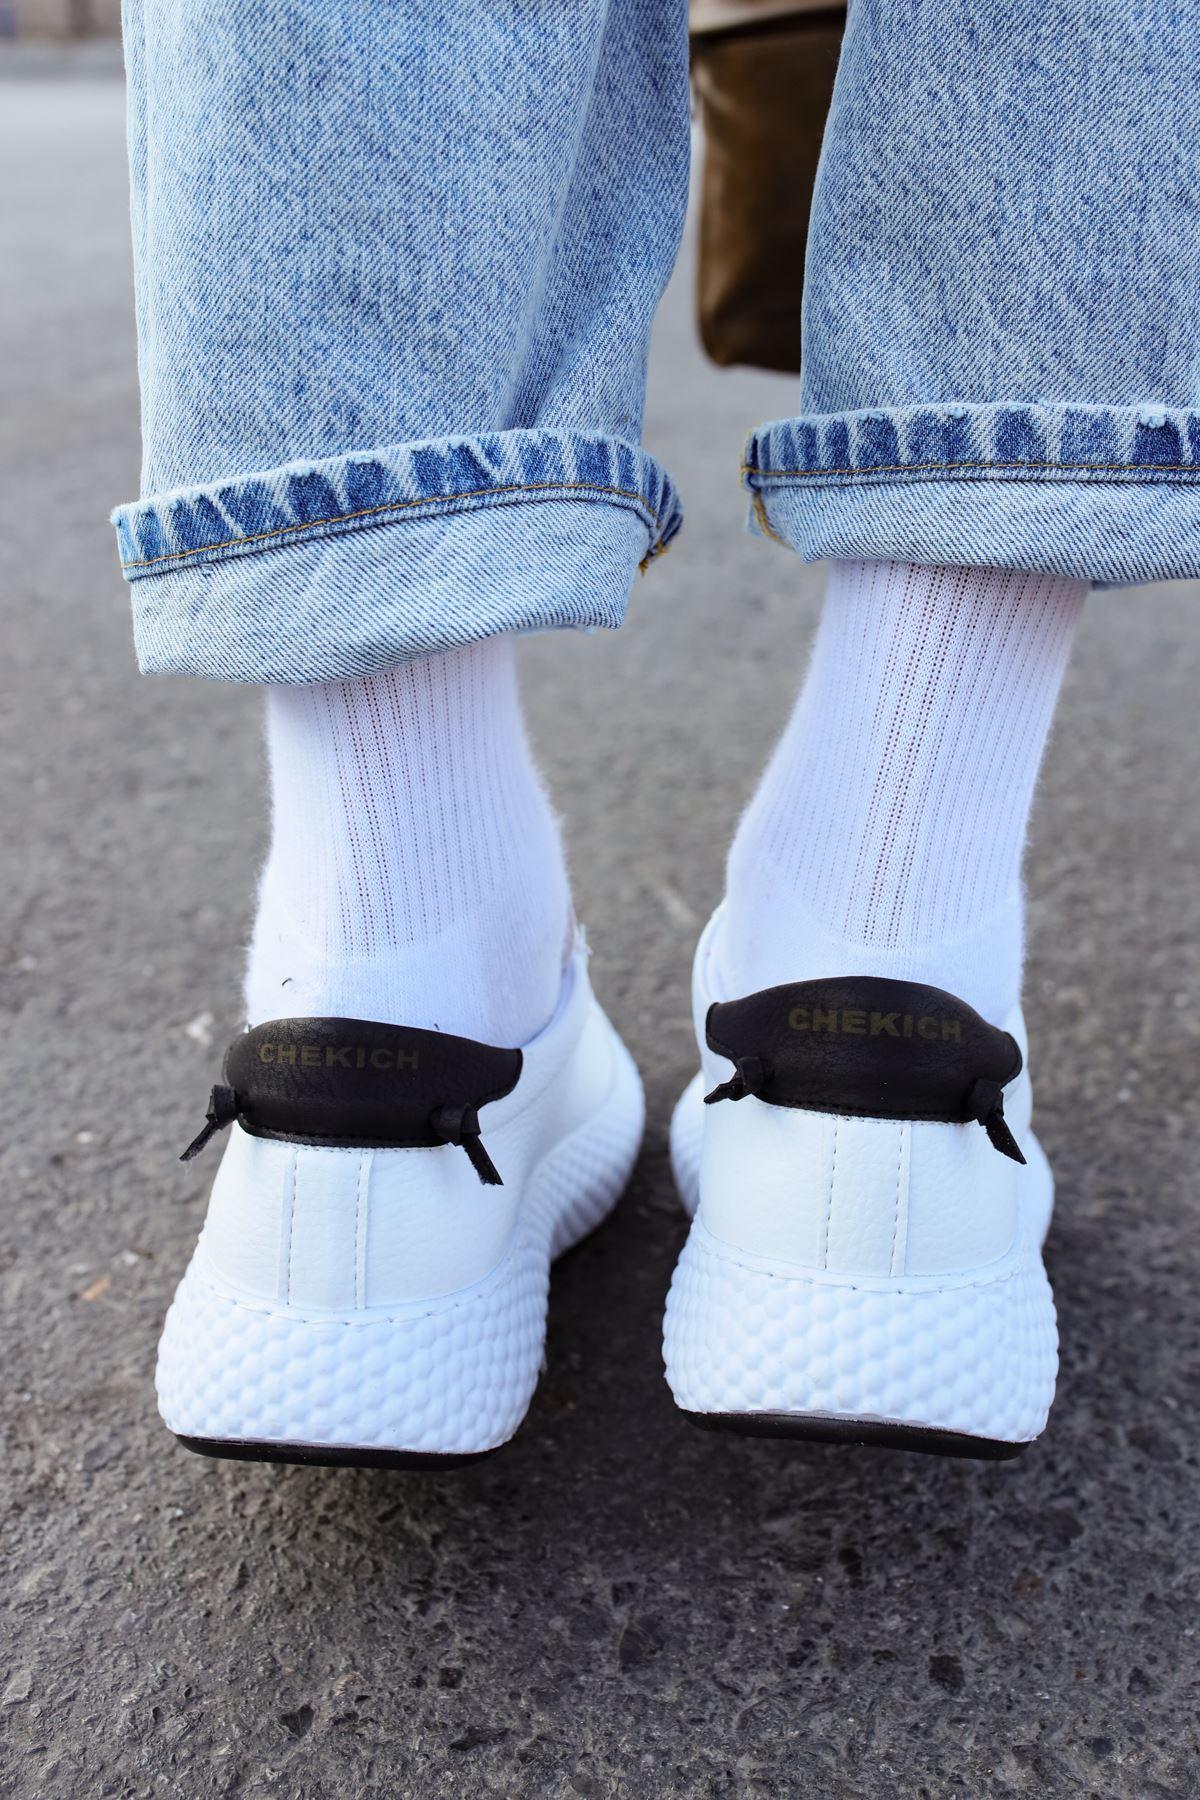 Chekich CH107 GBT Erkek Ayakkabı BEYAZ / SİYAH